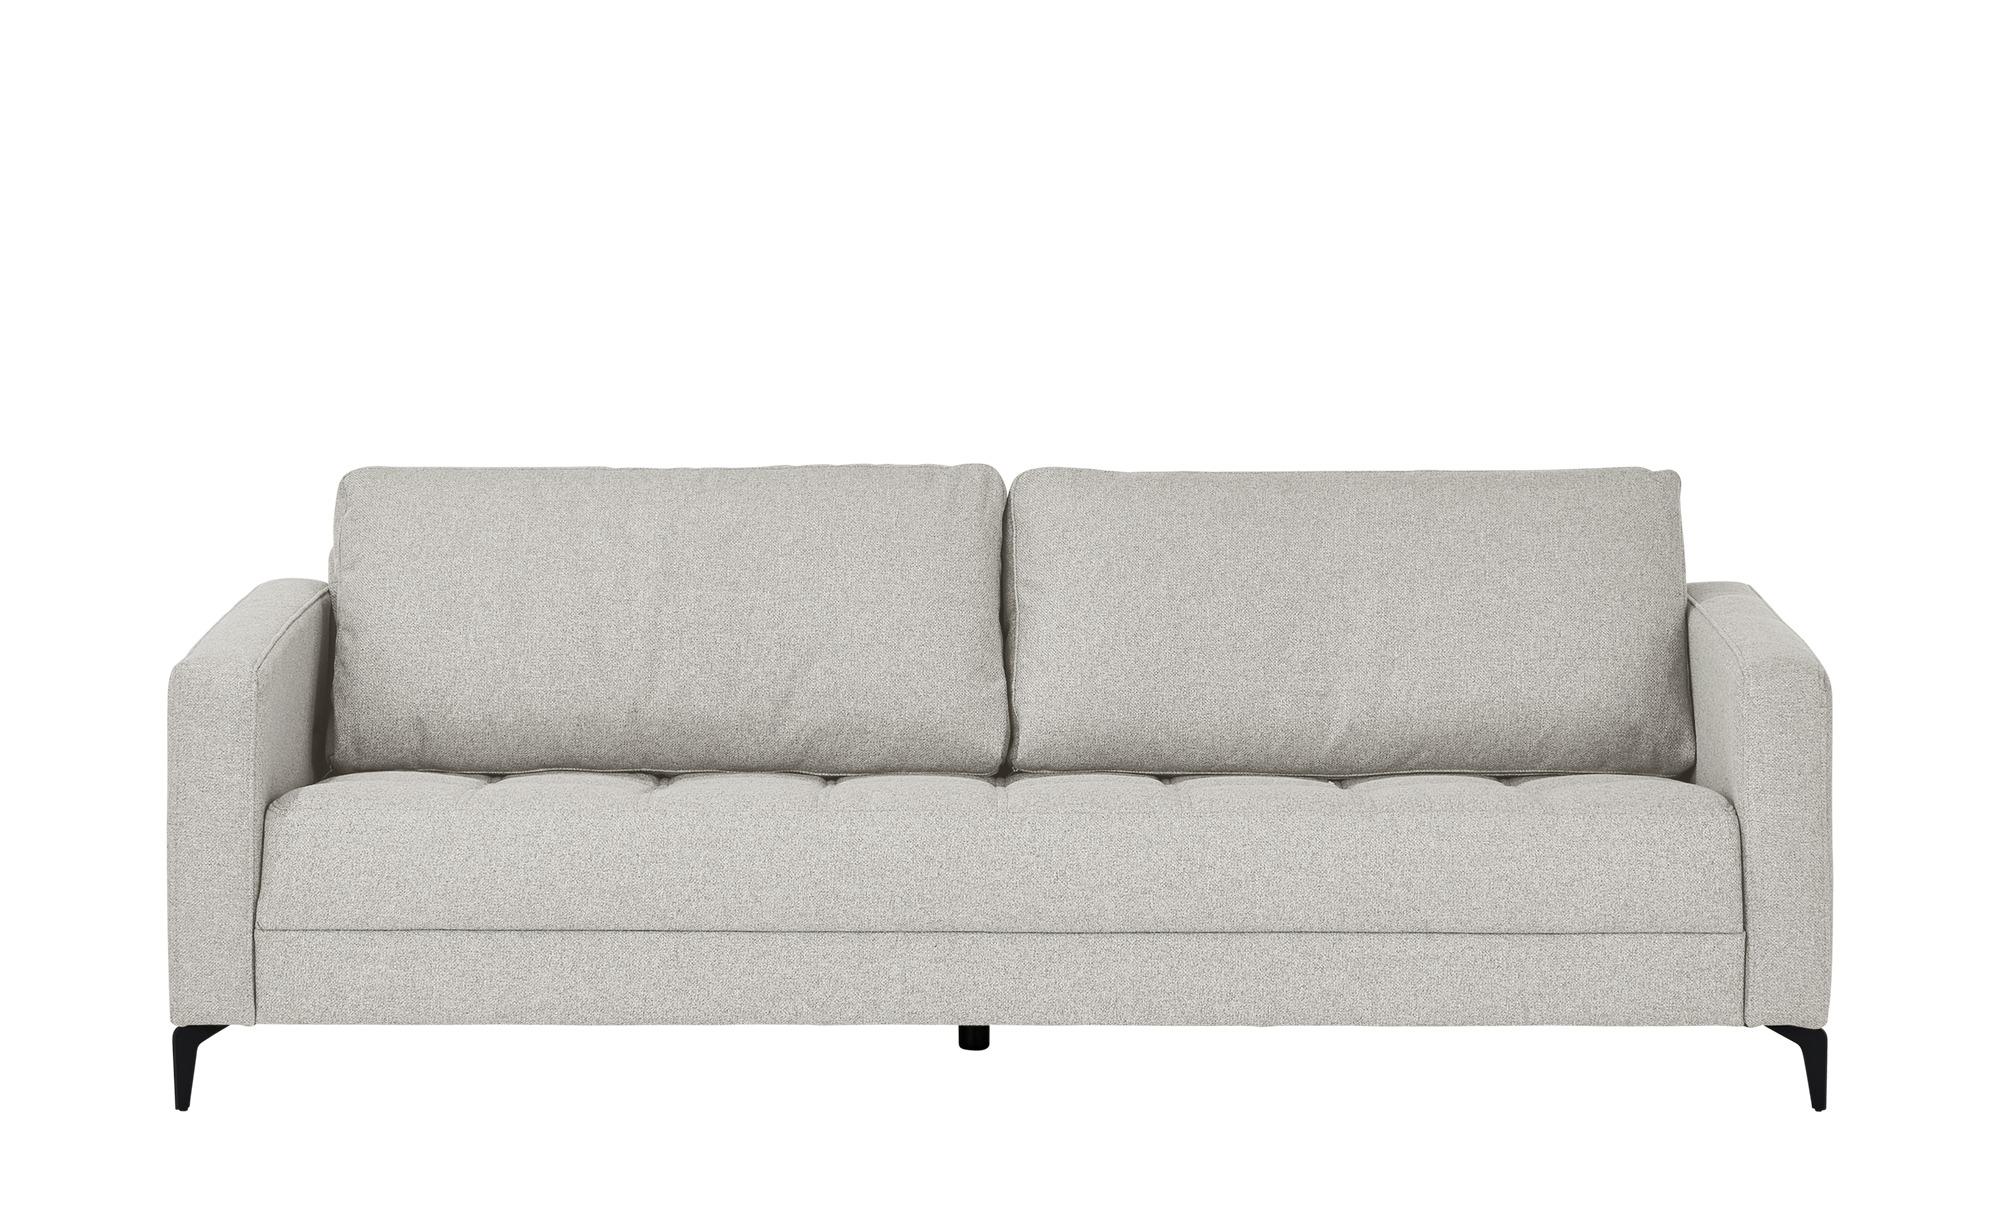 smart Sofa  Gesa ¦ grau ¦ Maße (cm): B: 228 H: 83 T: 91 Polstermöbel > Sofas > 3-Sitzer - Höffner